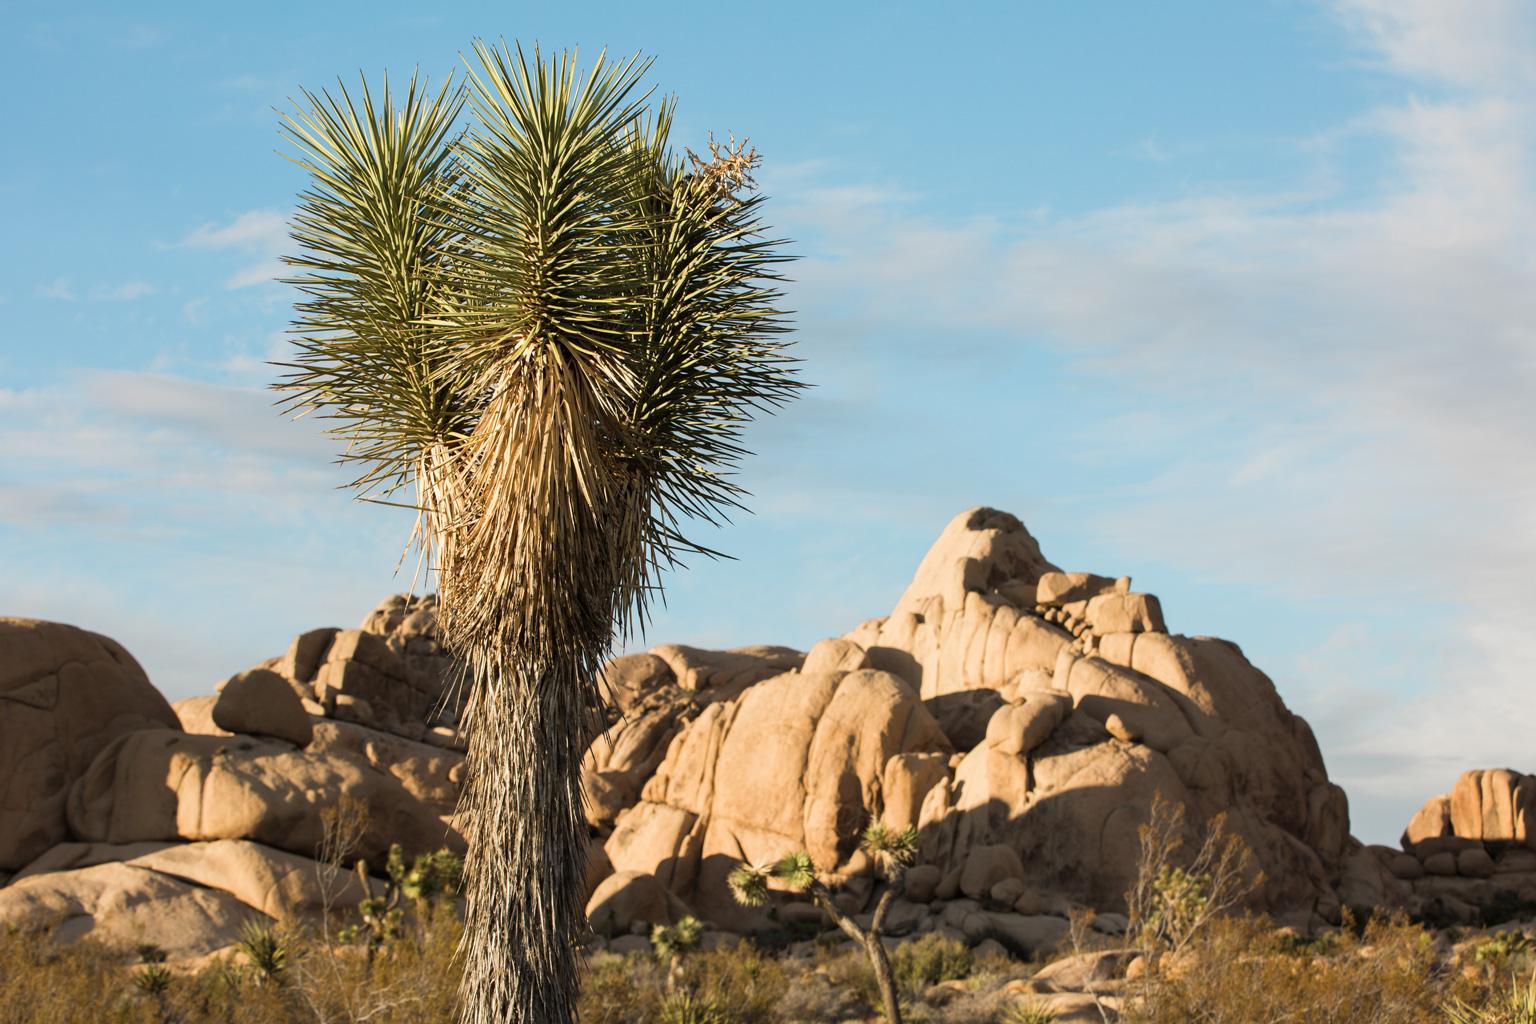 CindyGiovagnoli_Joshua_Tree_National_Park_California_Mojave_Desert_Cholla_Garden_Hidden_Valley_climbing_hiking_camping-016.jpg